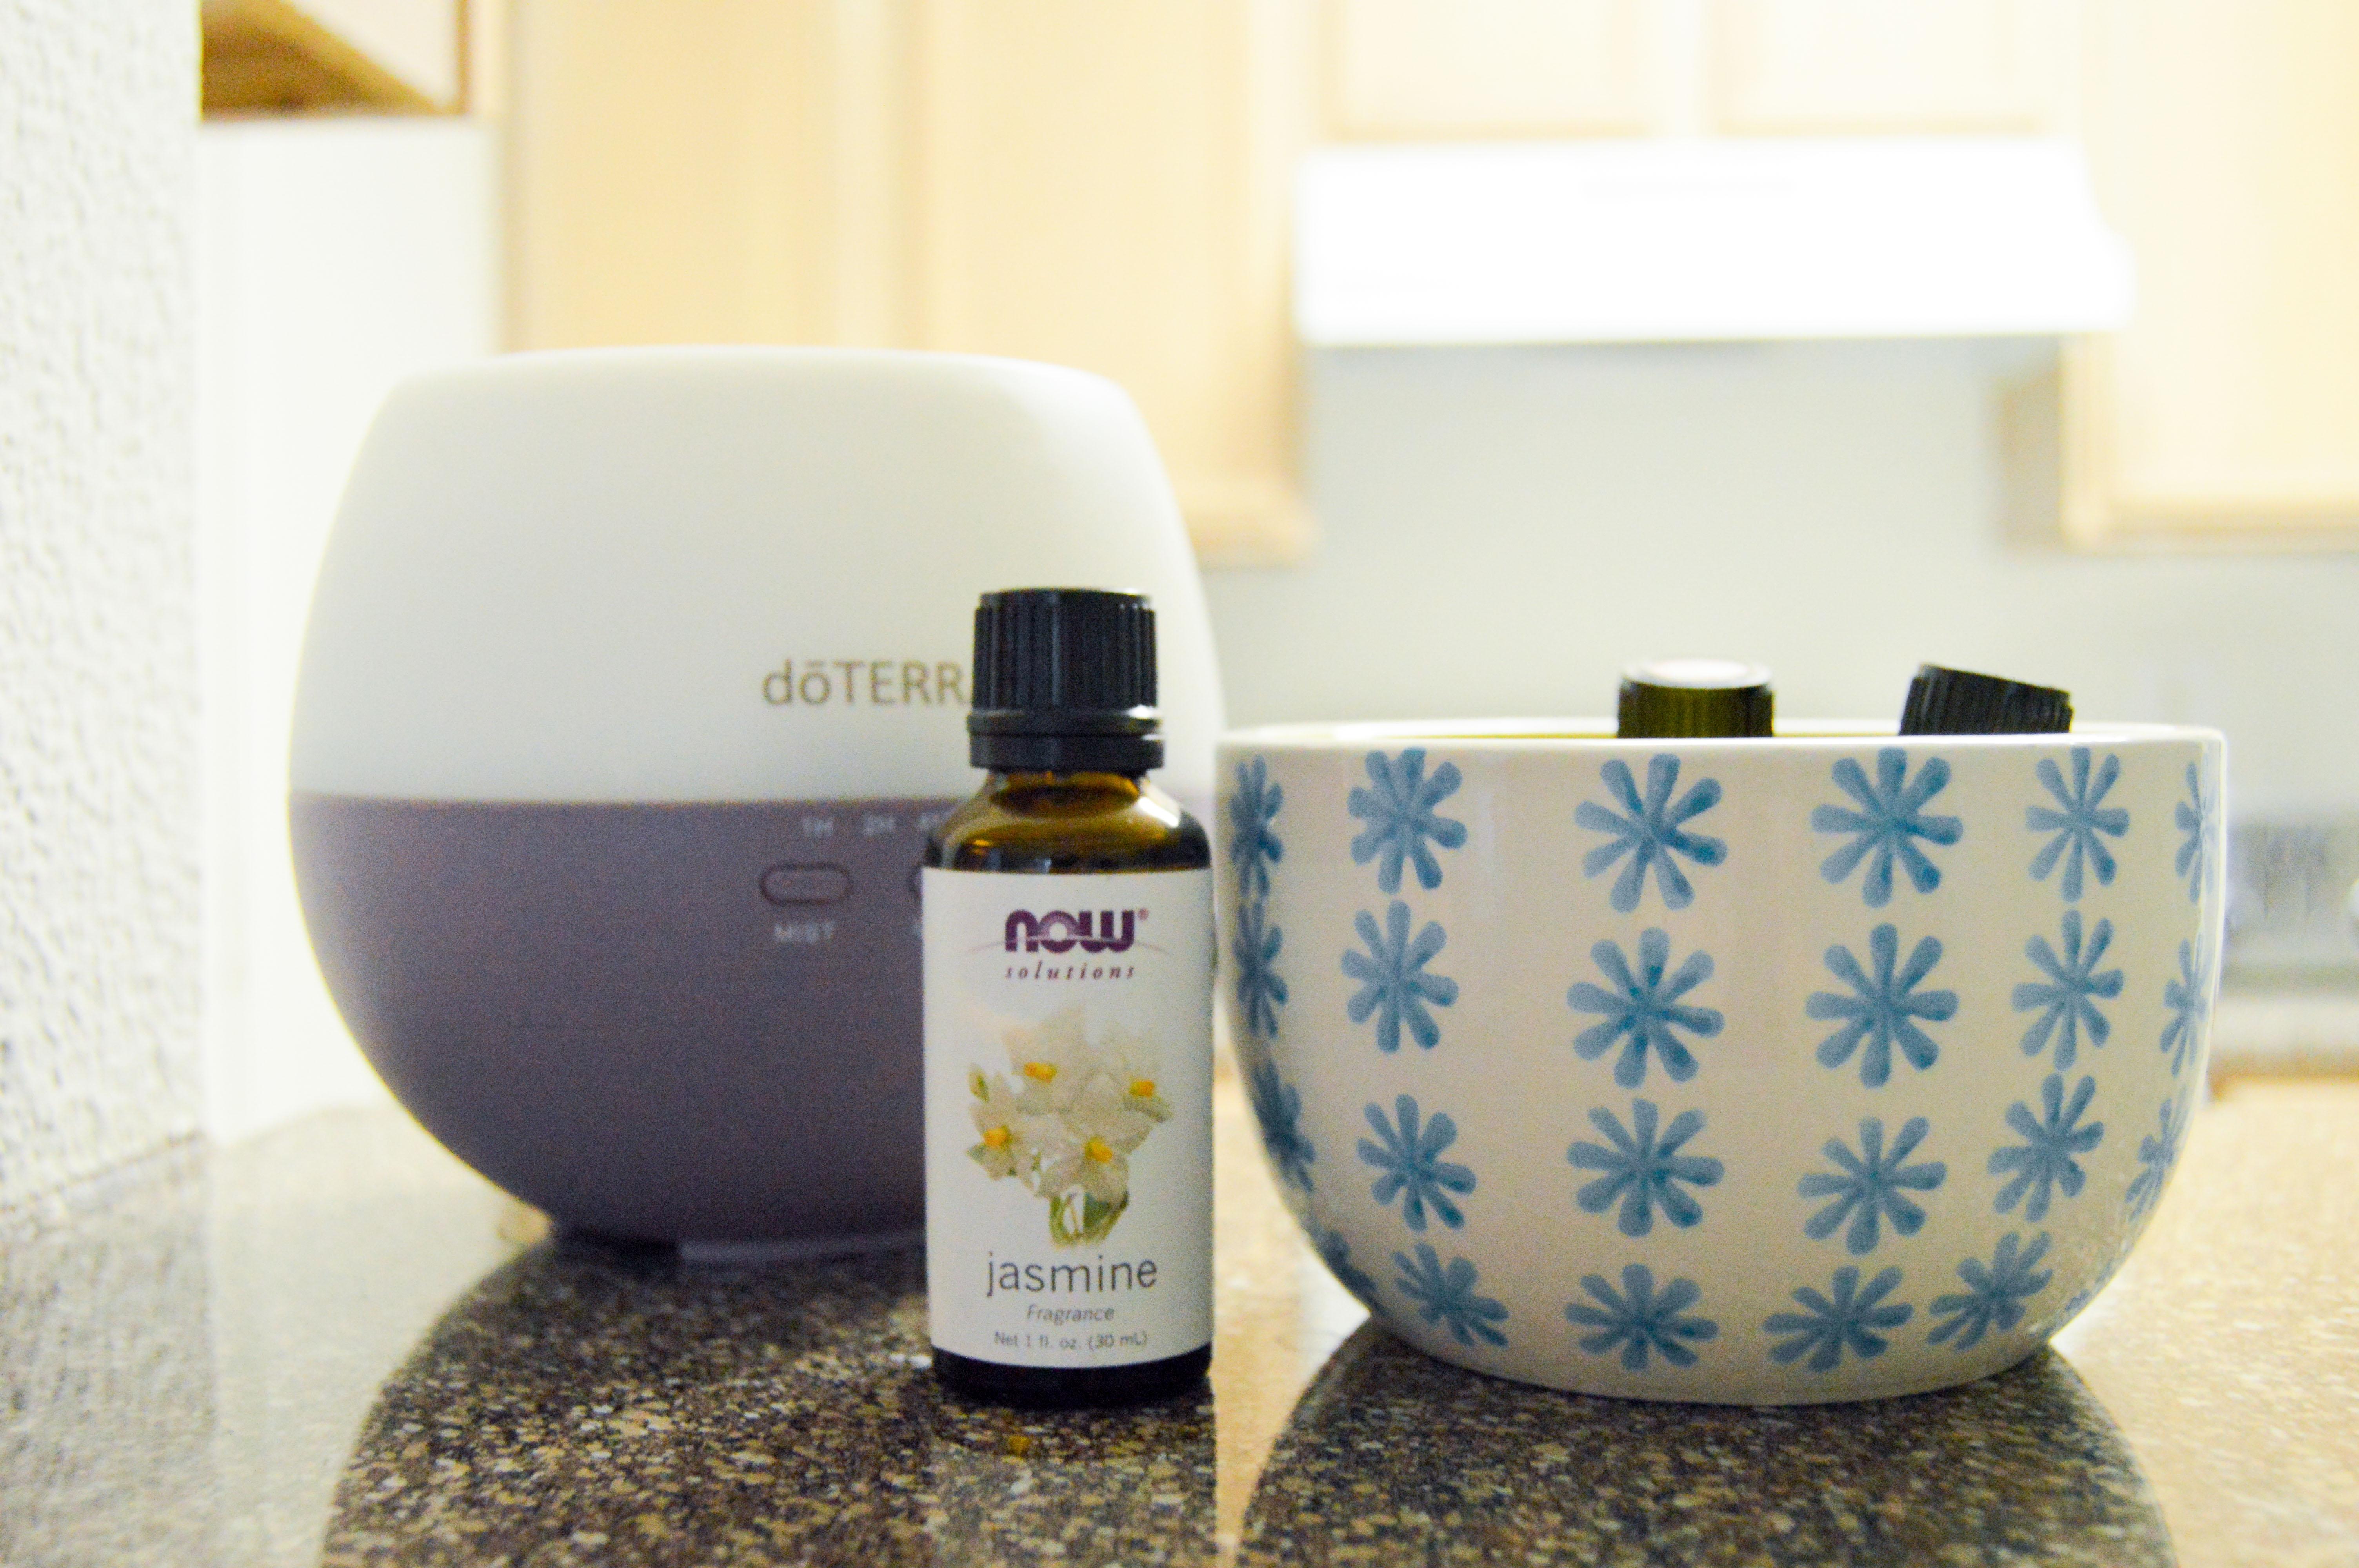 doterra essential oils diffuser